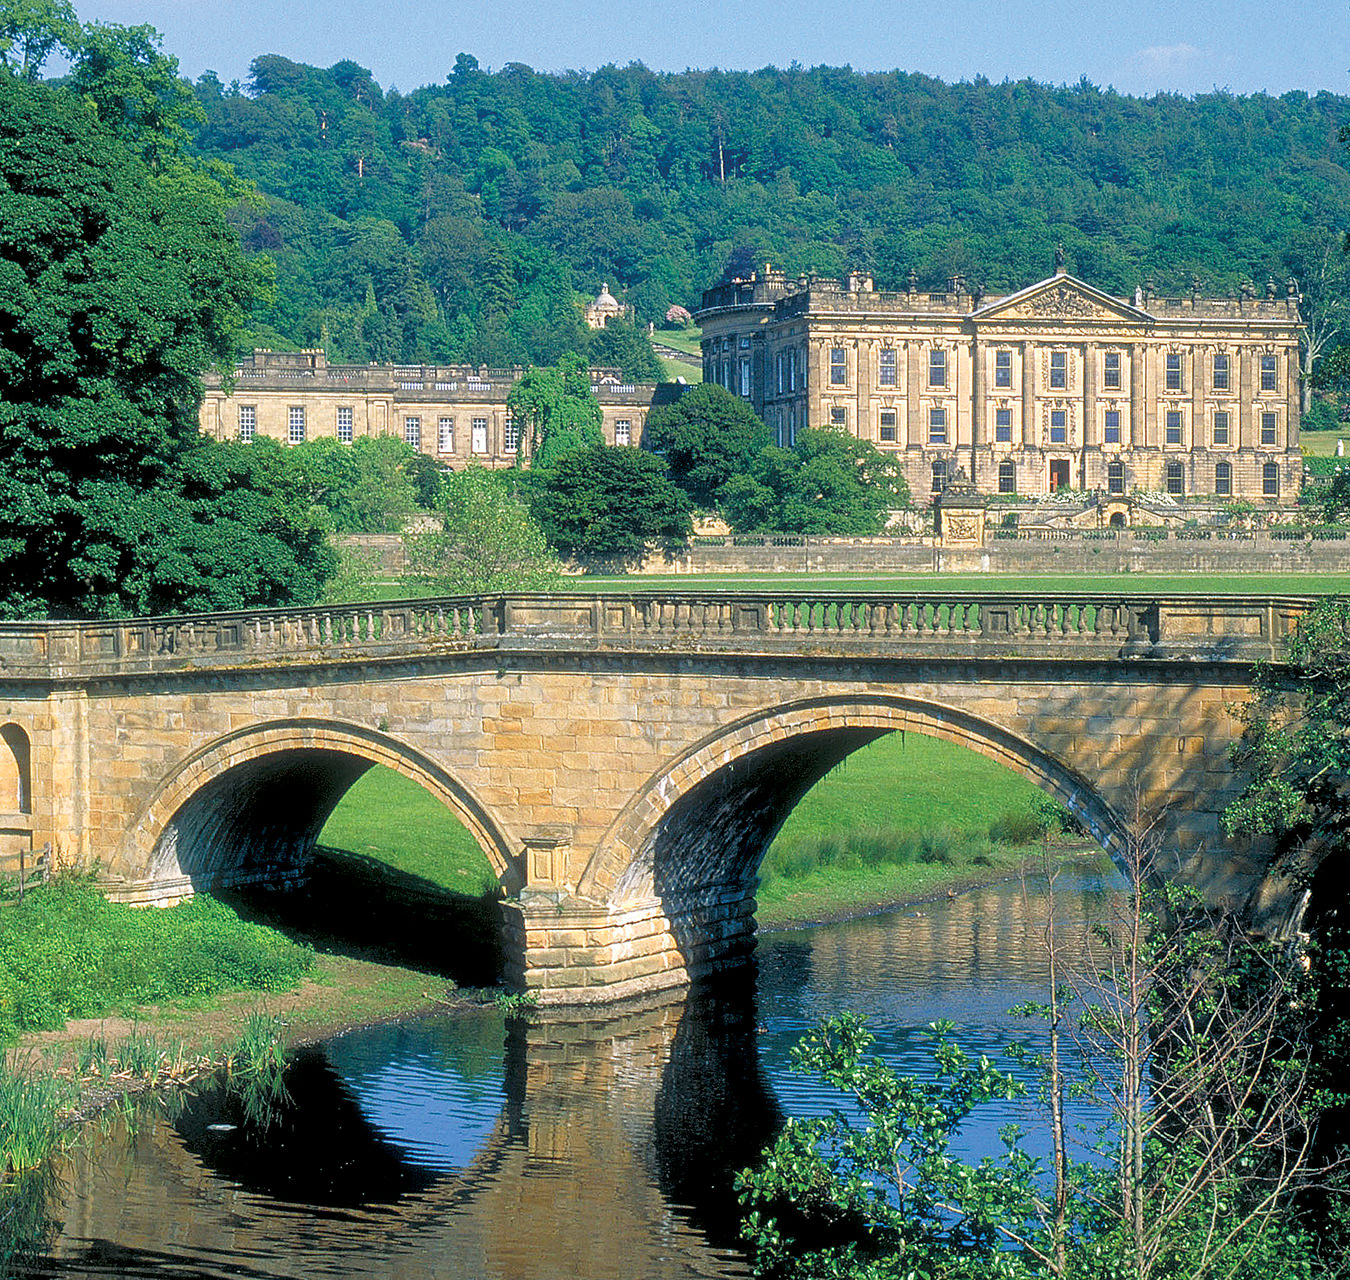 NUVO Magazine: A Persuasive Trip through Jane Austen Country